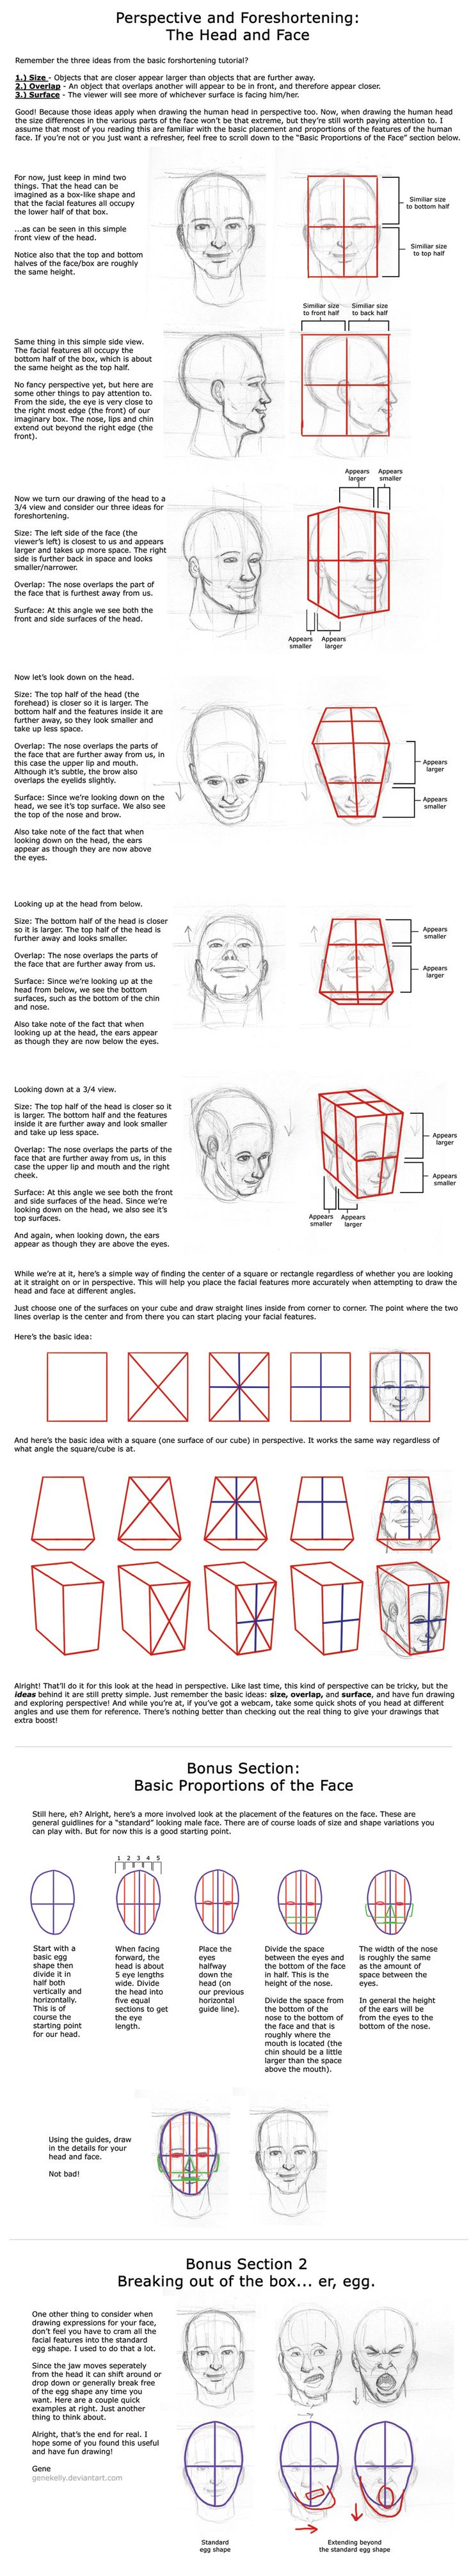 Tues 4: Head in Perspective by genekelly.deviantart.com on @deviantART